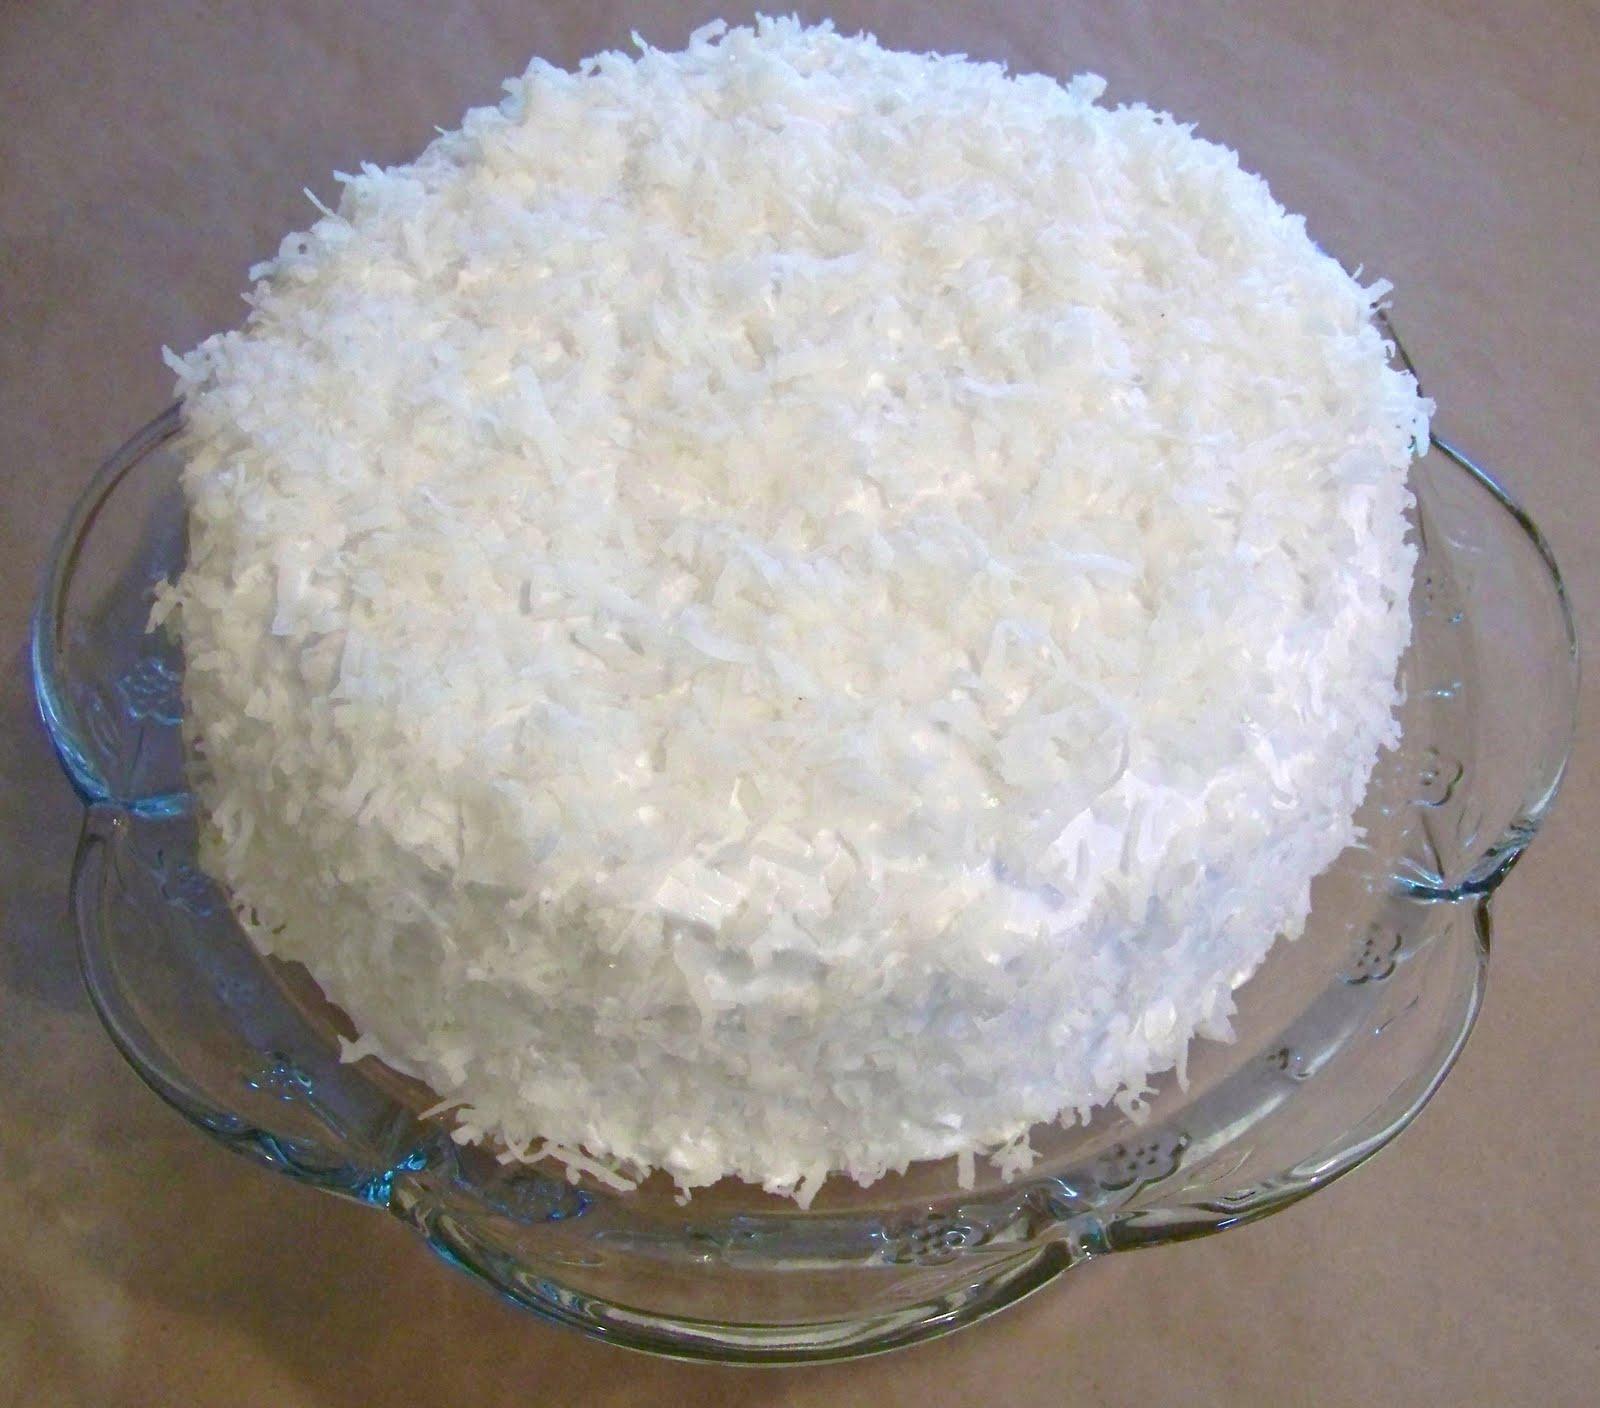 http://1.bp.blogspot.com/_bDE5l4OnSnc/Sw1mCJKRVRI/AAAAAAAACsw/9yNHS5cUKXE/s1600/cake-003.jpg